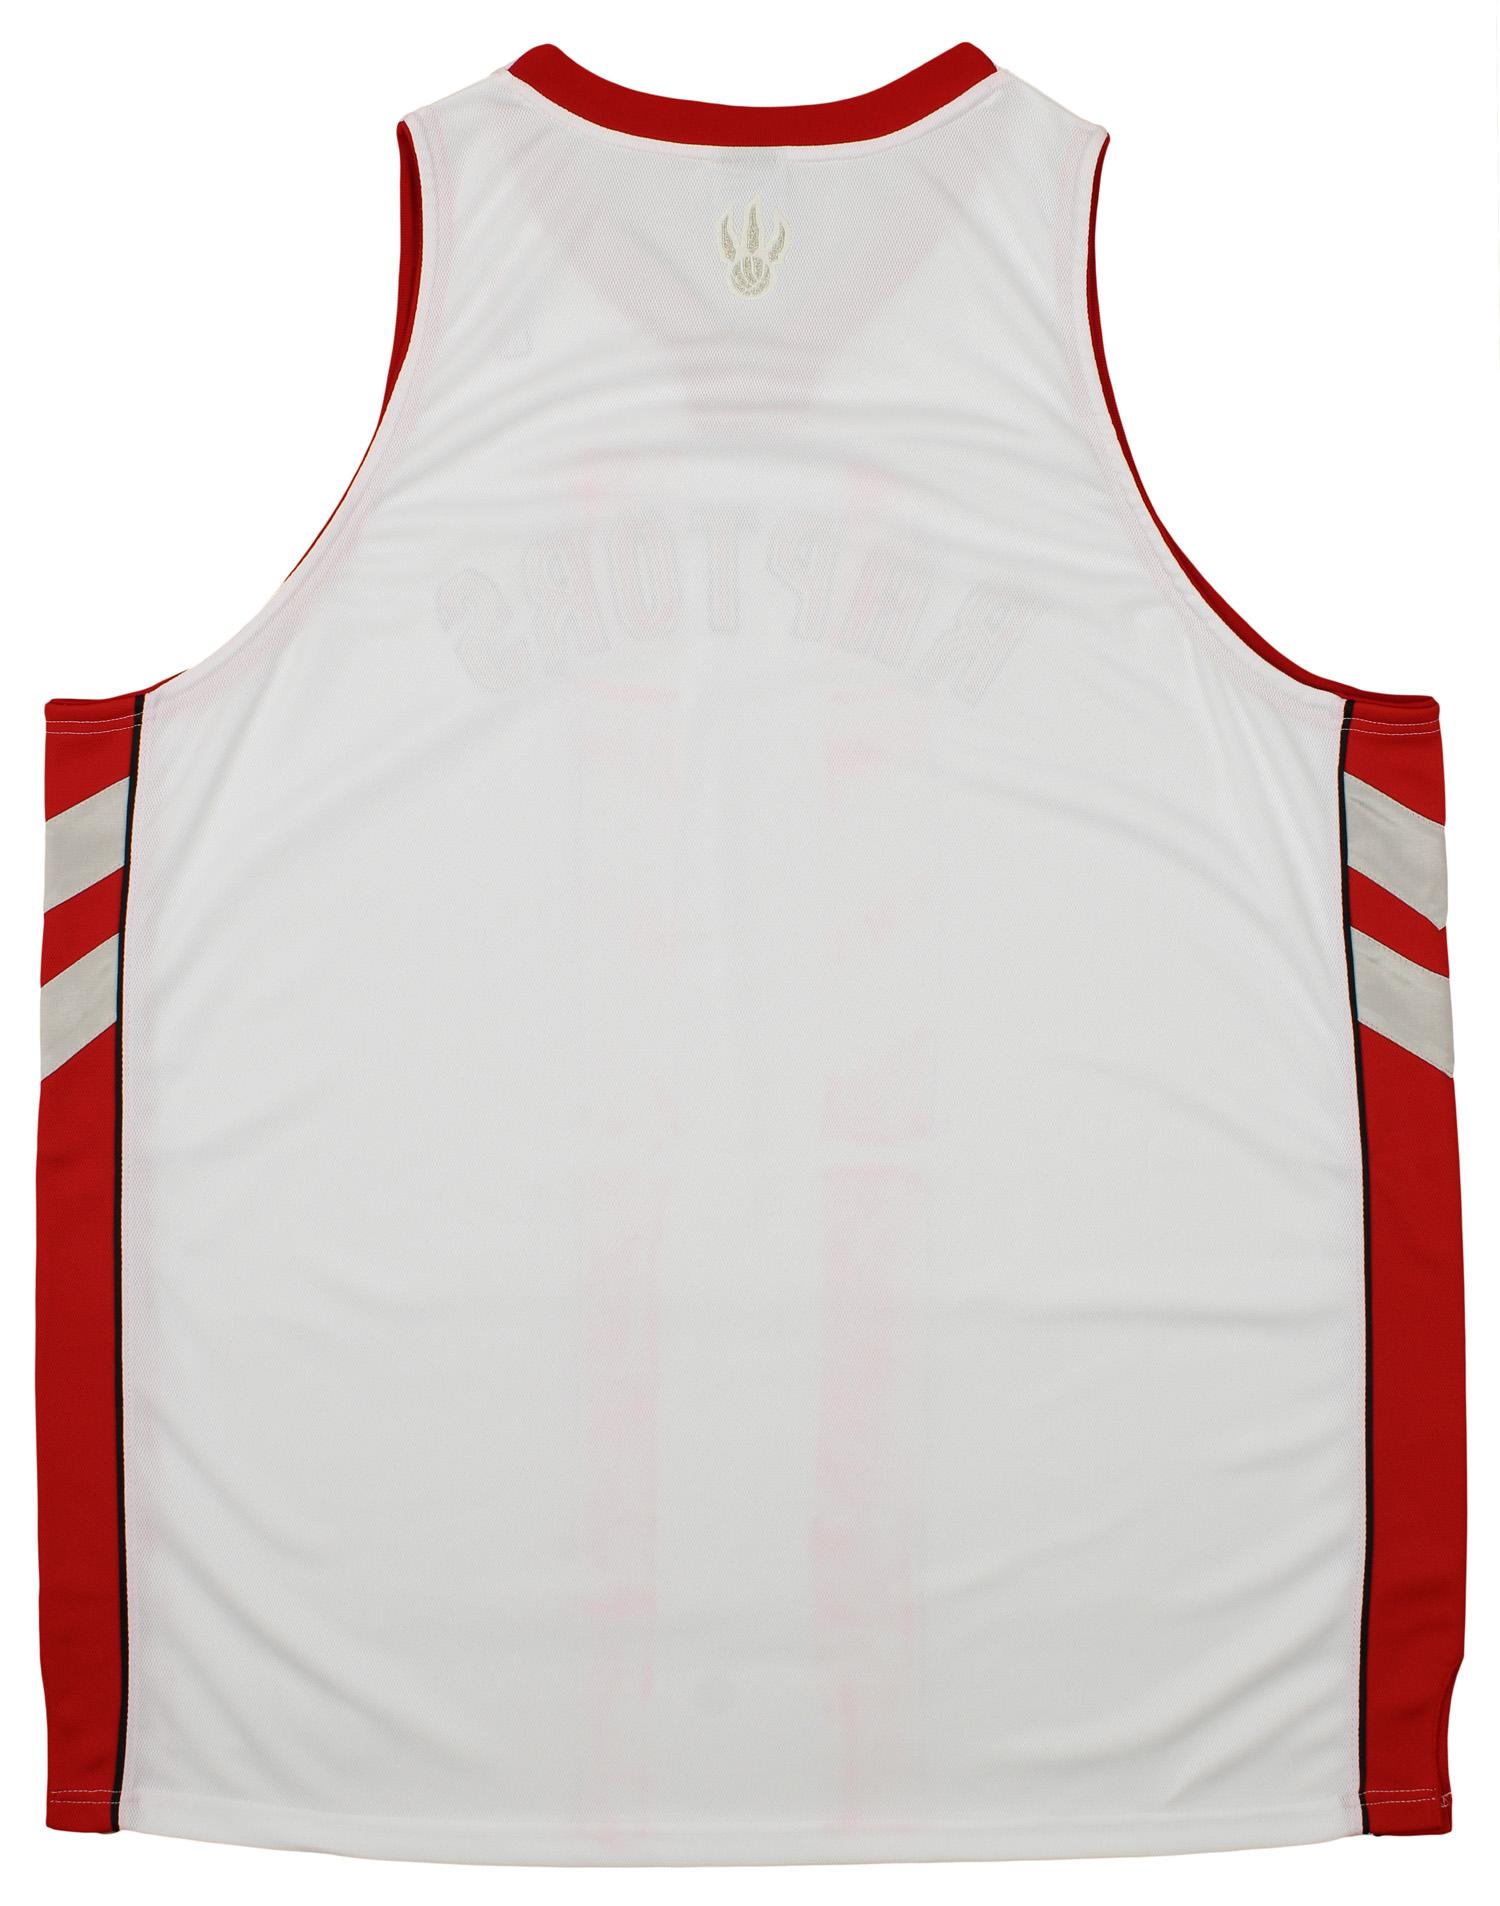 975ebda3201 Adidas NBA Men s Toronto Raptors Blank Basketball Jersey